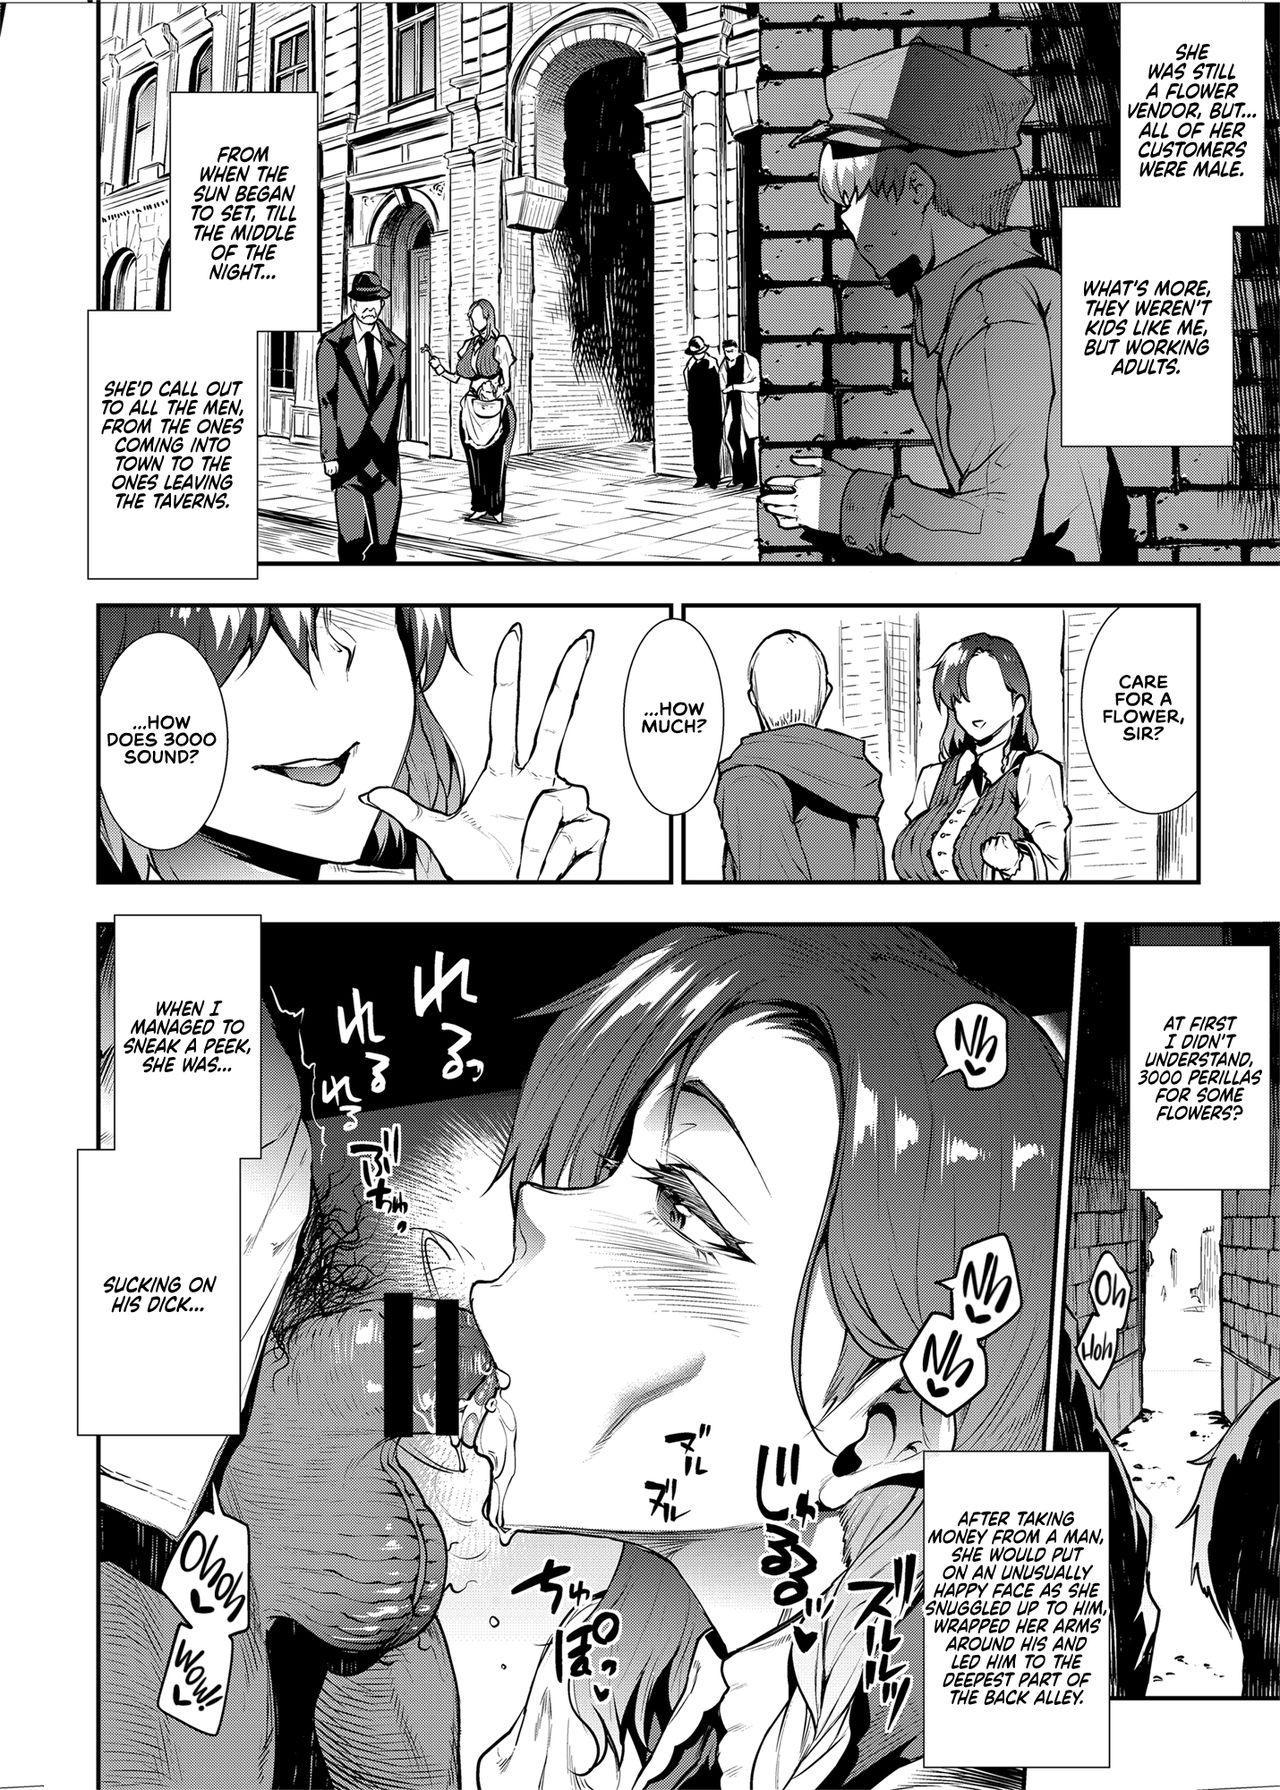 [ERECT TOUCH (Erect Sawaru)] Flower Vendor ~Hanauri Onee-san ni Yasashiku Fudeoroshi~ | Flower Vendor ~Gently Losing My Virginity To Miss Flower Vendor~ [English] [RedLantern] 11